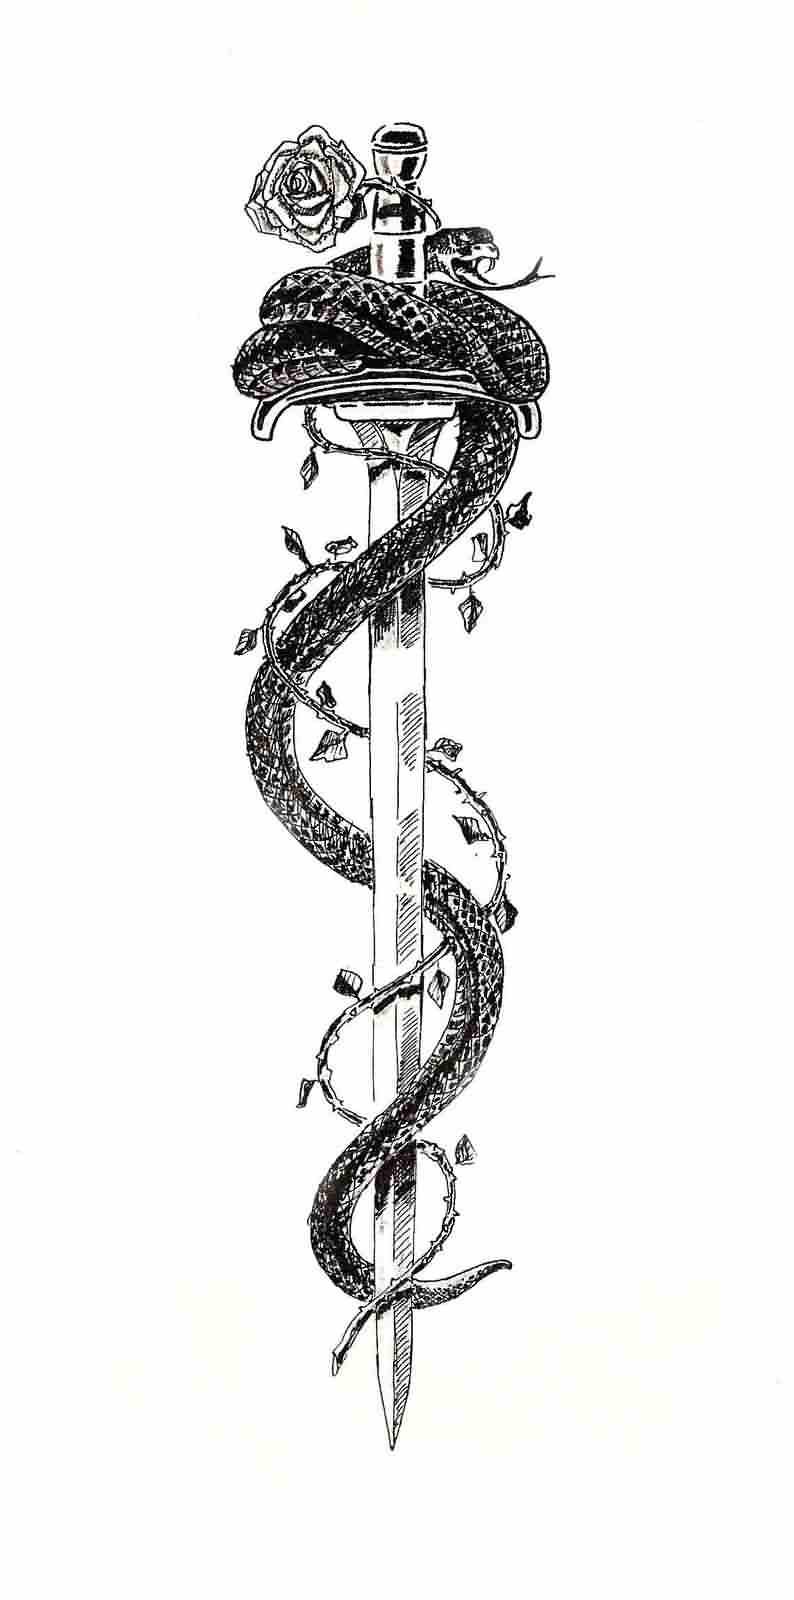 20 samurai sword tattoos and ideas for Sword tattoos tumblr